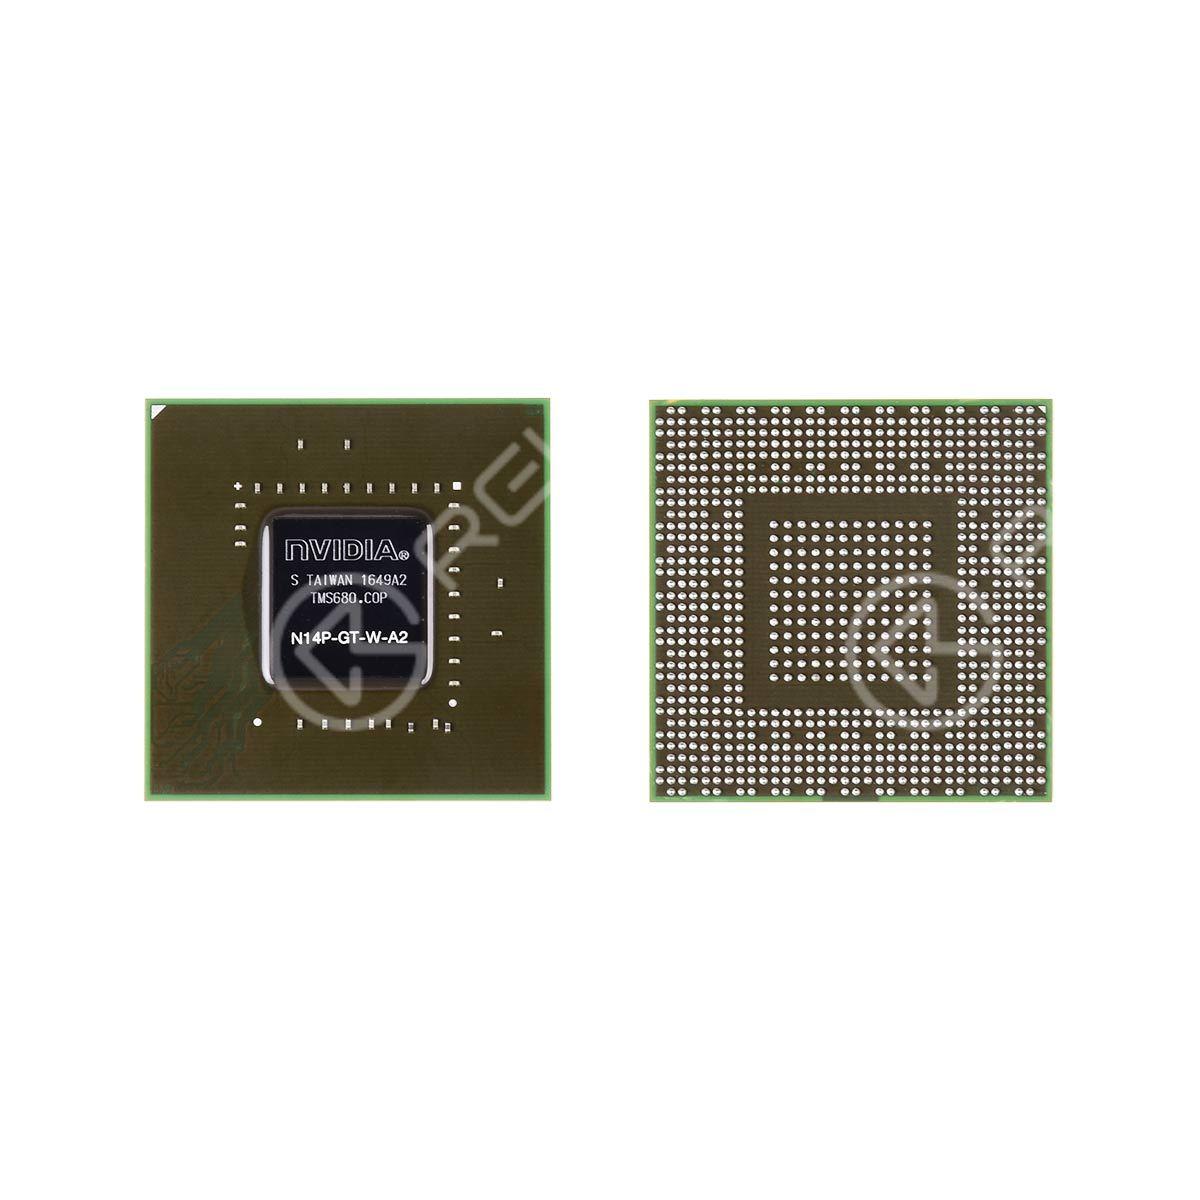 Nvidia GPU Graphic Chipset N13E-GT-W-A2